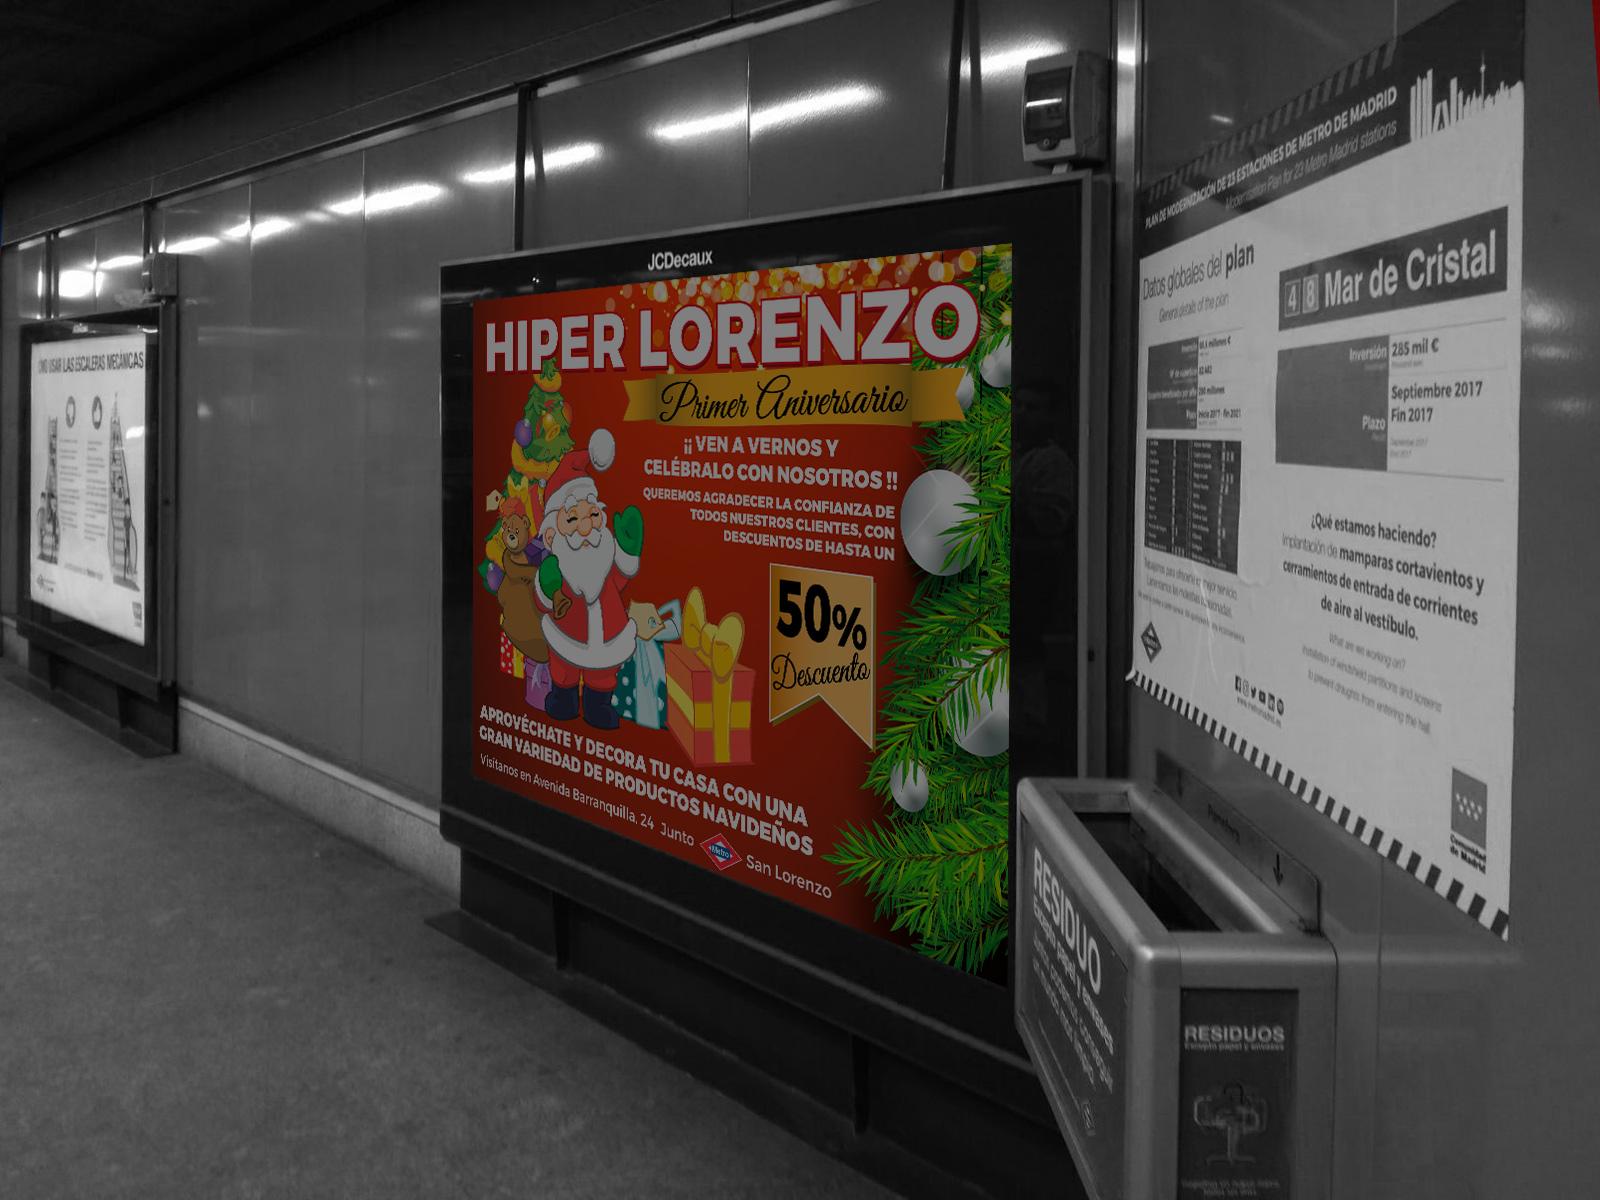 Hiper Lorenzo